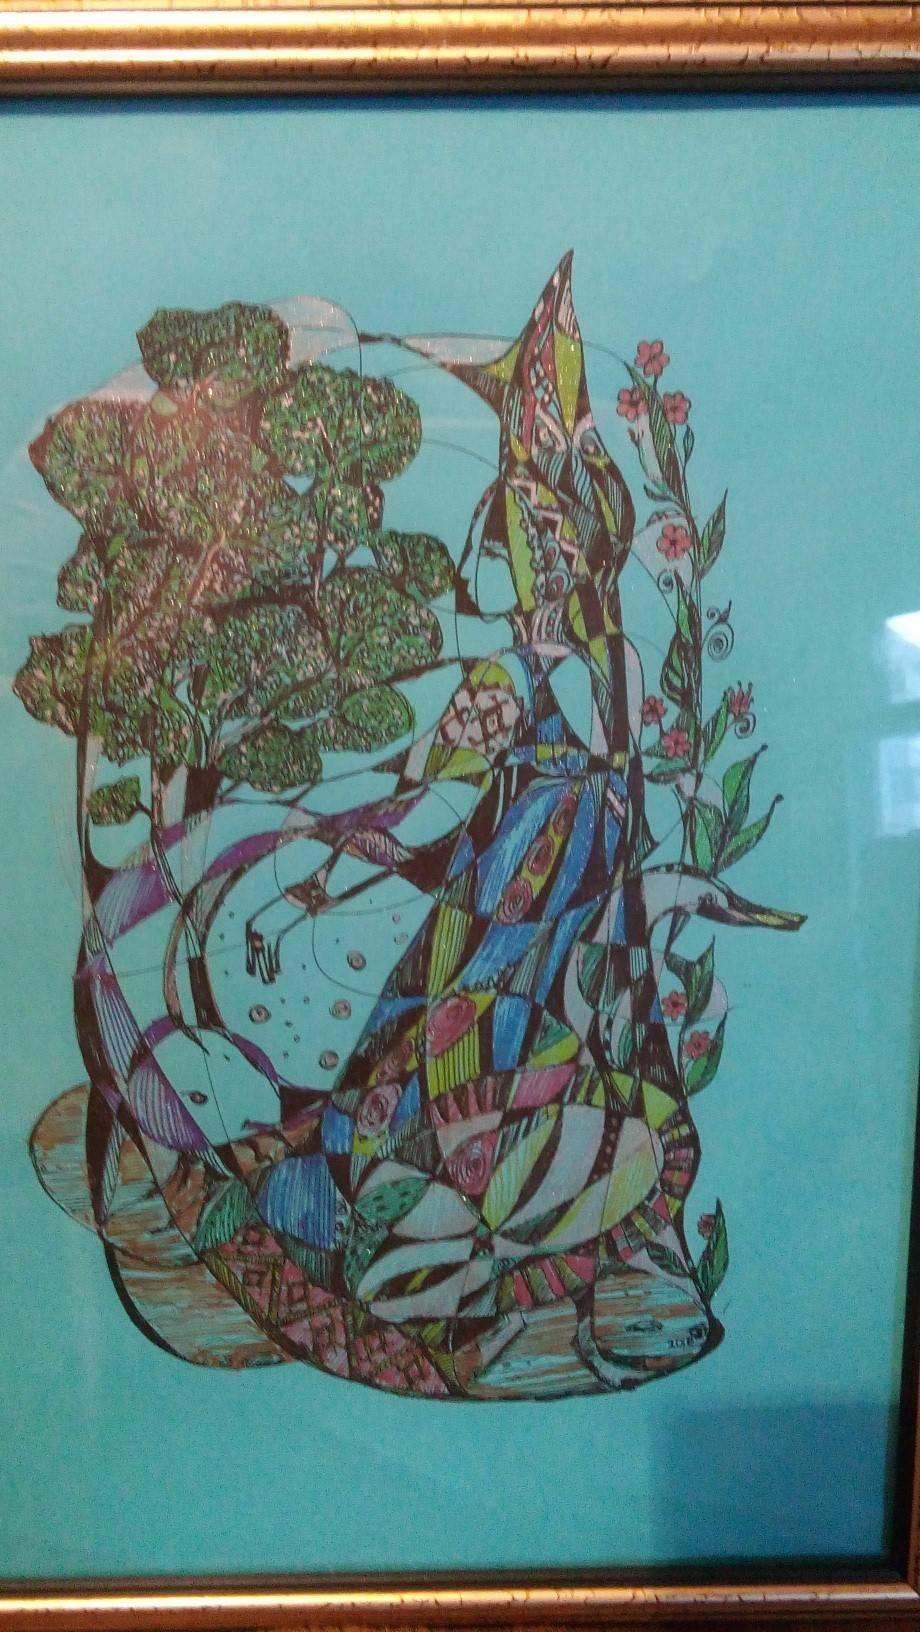 руна беркана  цветная бумага , гелевая ручка, глиттер, металлик; 30х21 см